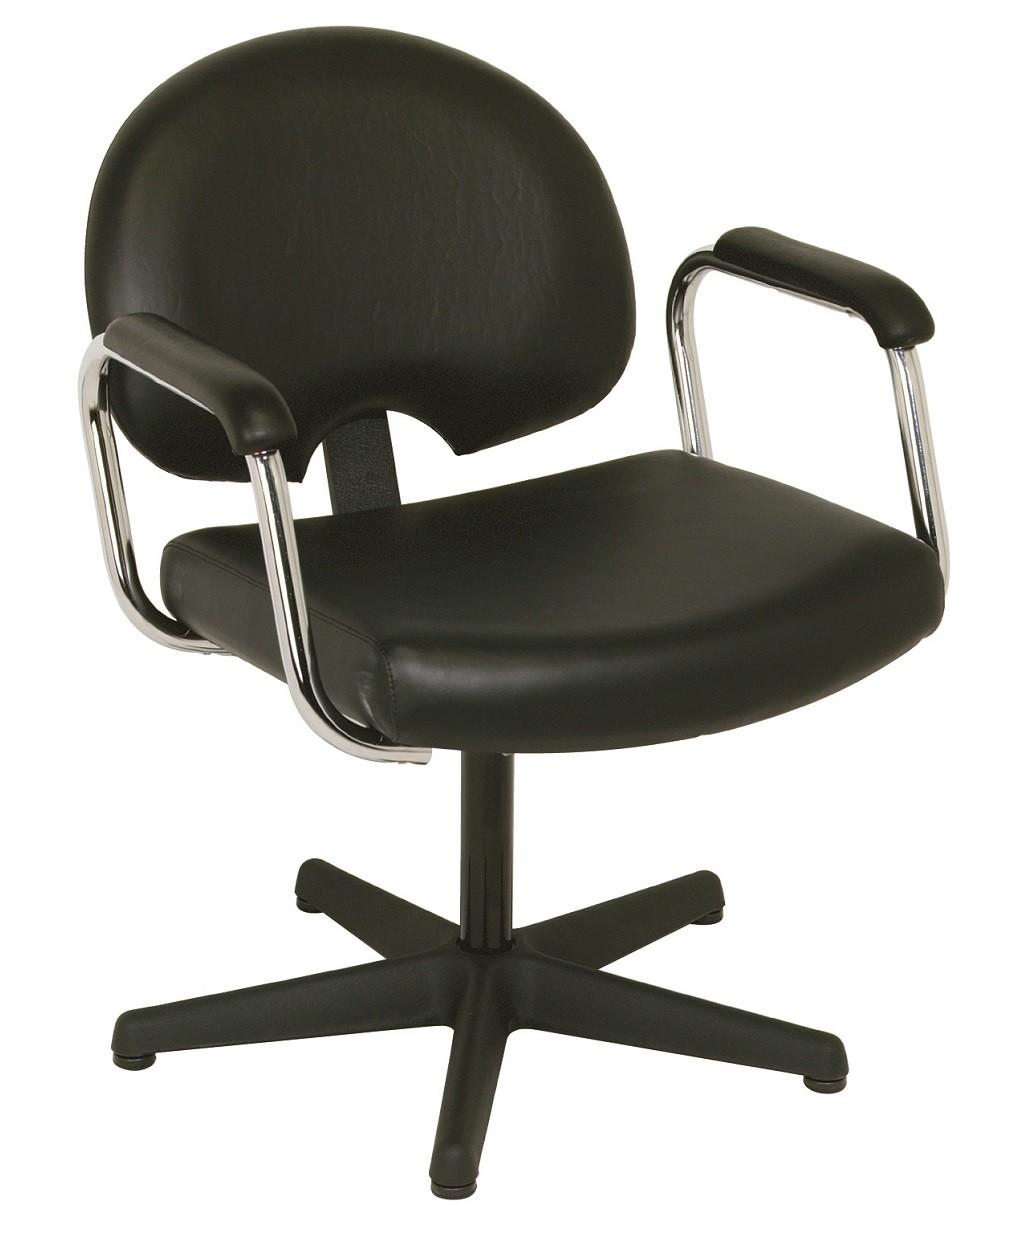 Belvedere AH24C Arch Shampoo Chair